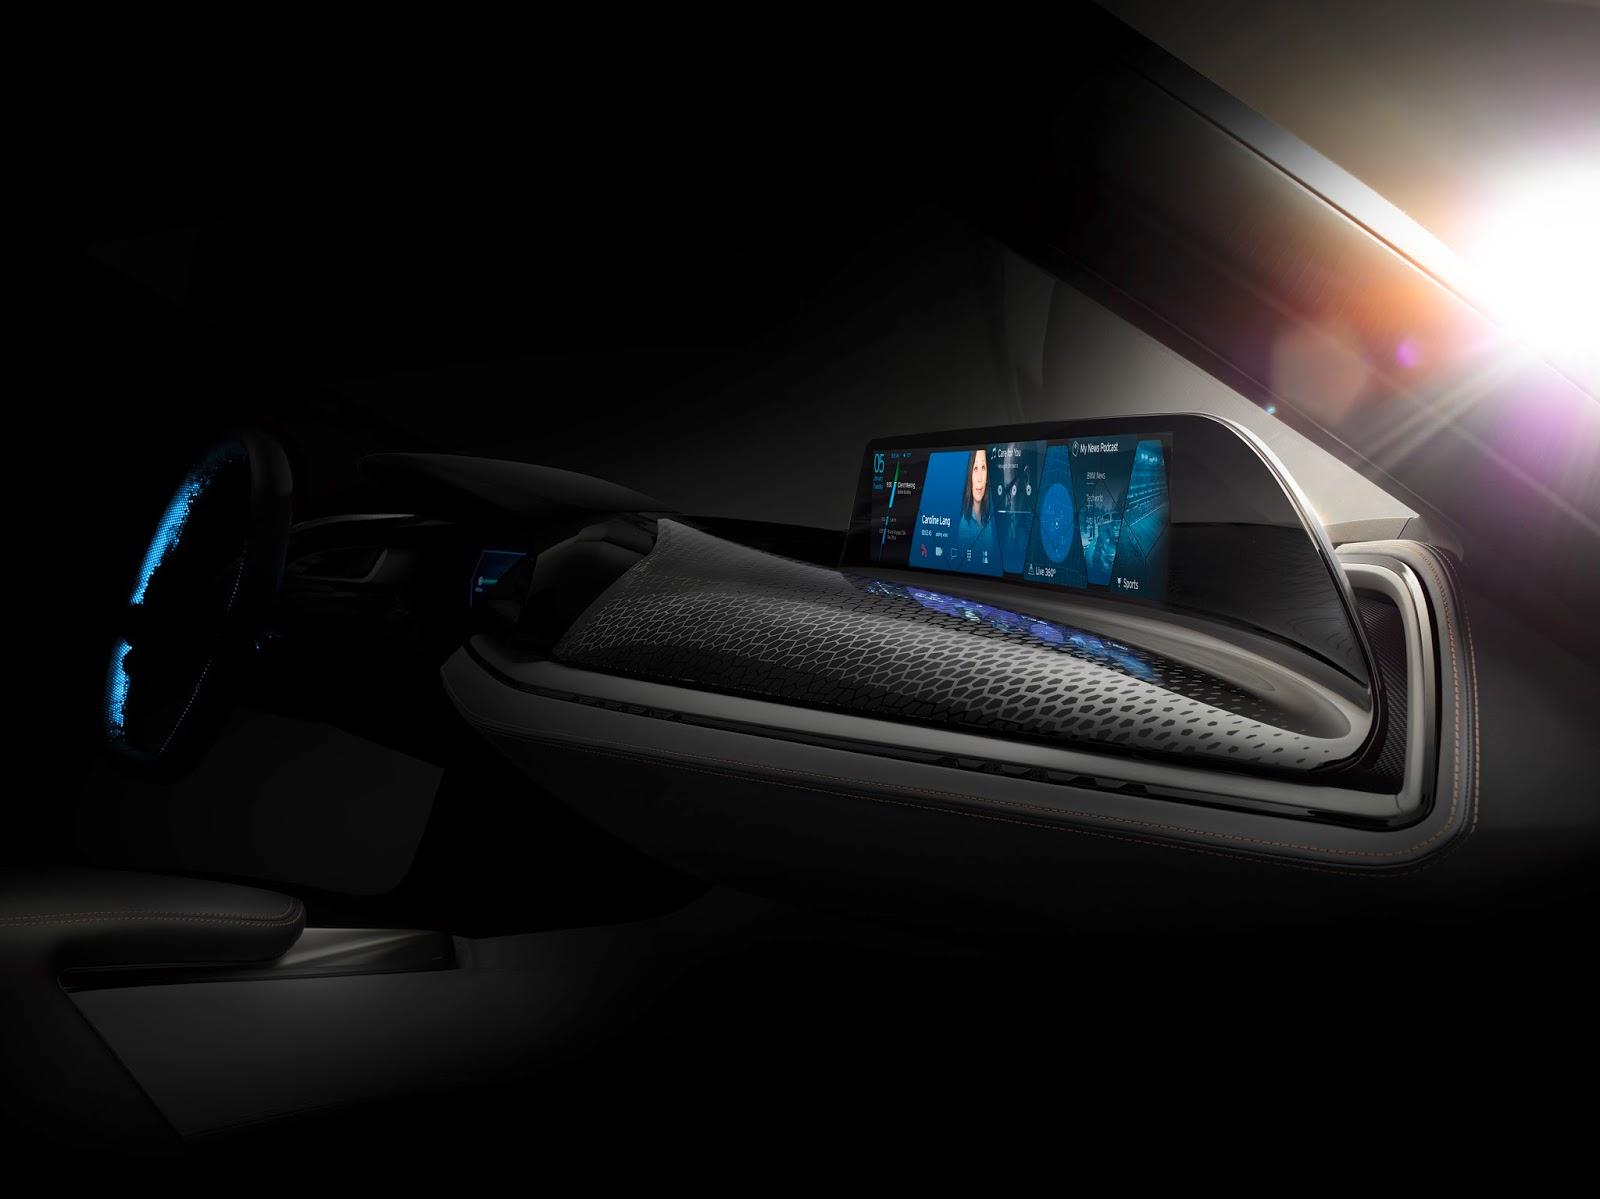 P90206946 highRes bmw group ces 2016 Η BMW παρουσιάζει το σύστημα AirTouch με τεχνολογία οθόνης αφής χωρίς φυσική επαφή. BMW, Τεχνολογία